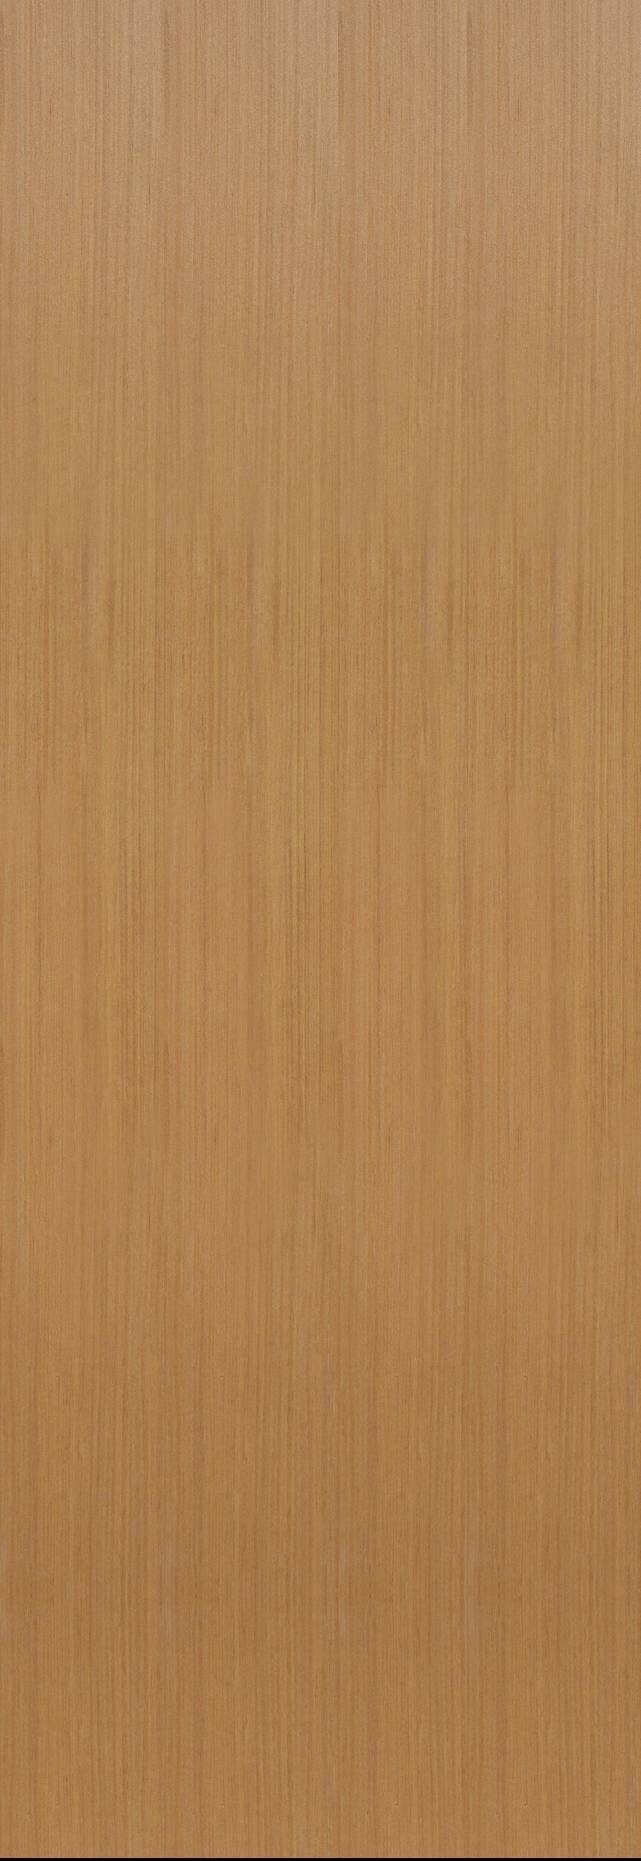 Tivoli А-1 Invisible цвет - Миланский орех Без стекла (ДГ)